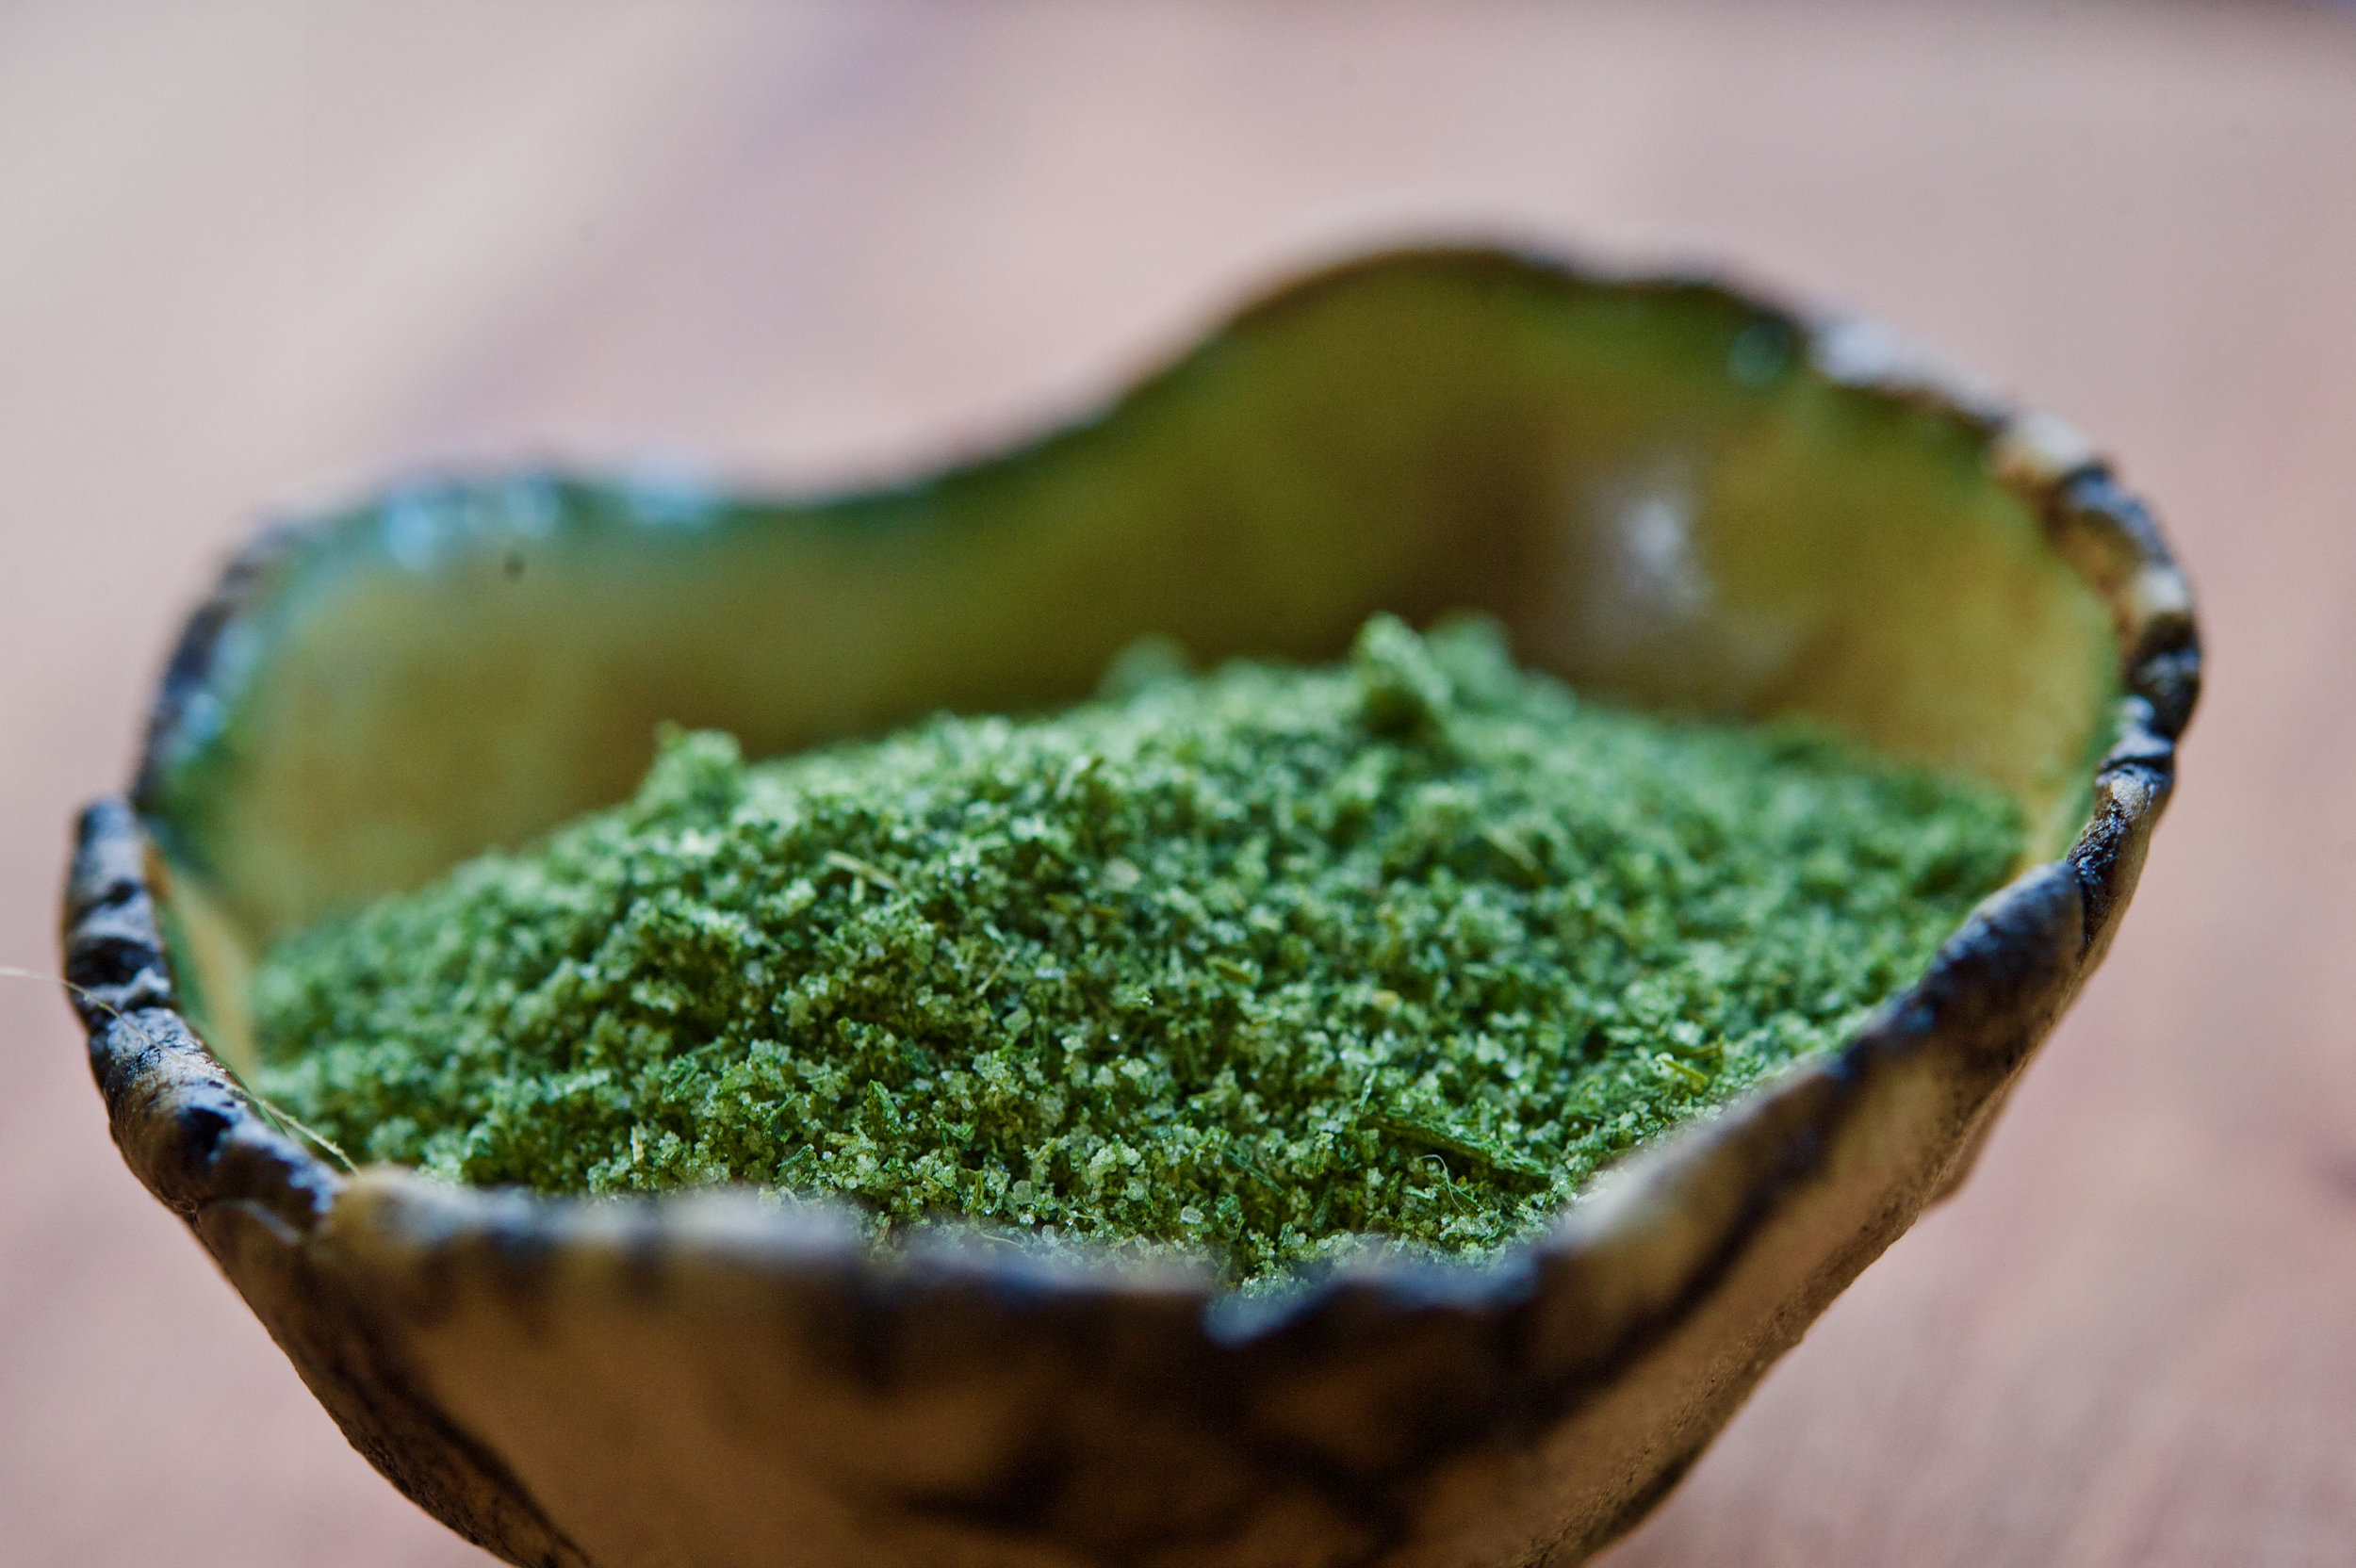 ramp salt is an excellent way to preserve the plant's elusive wild flavor